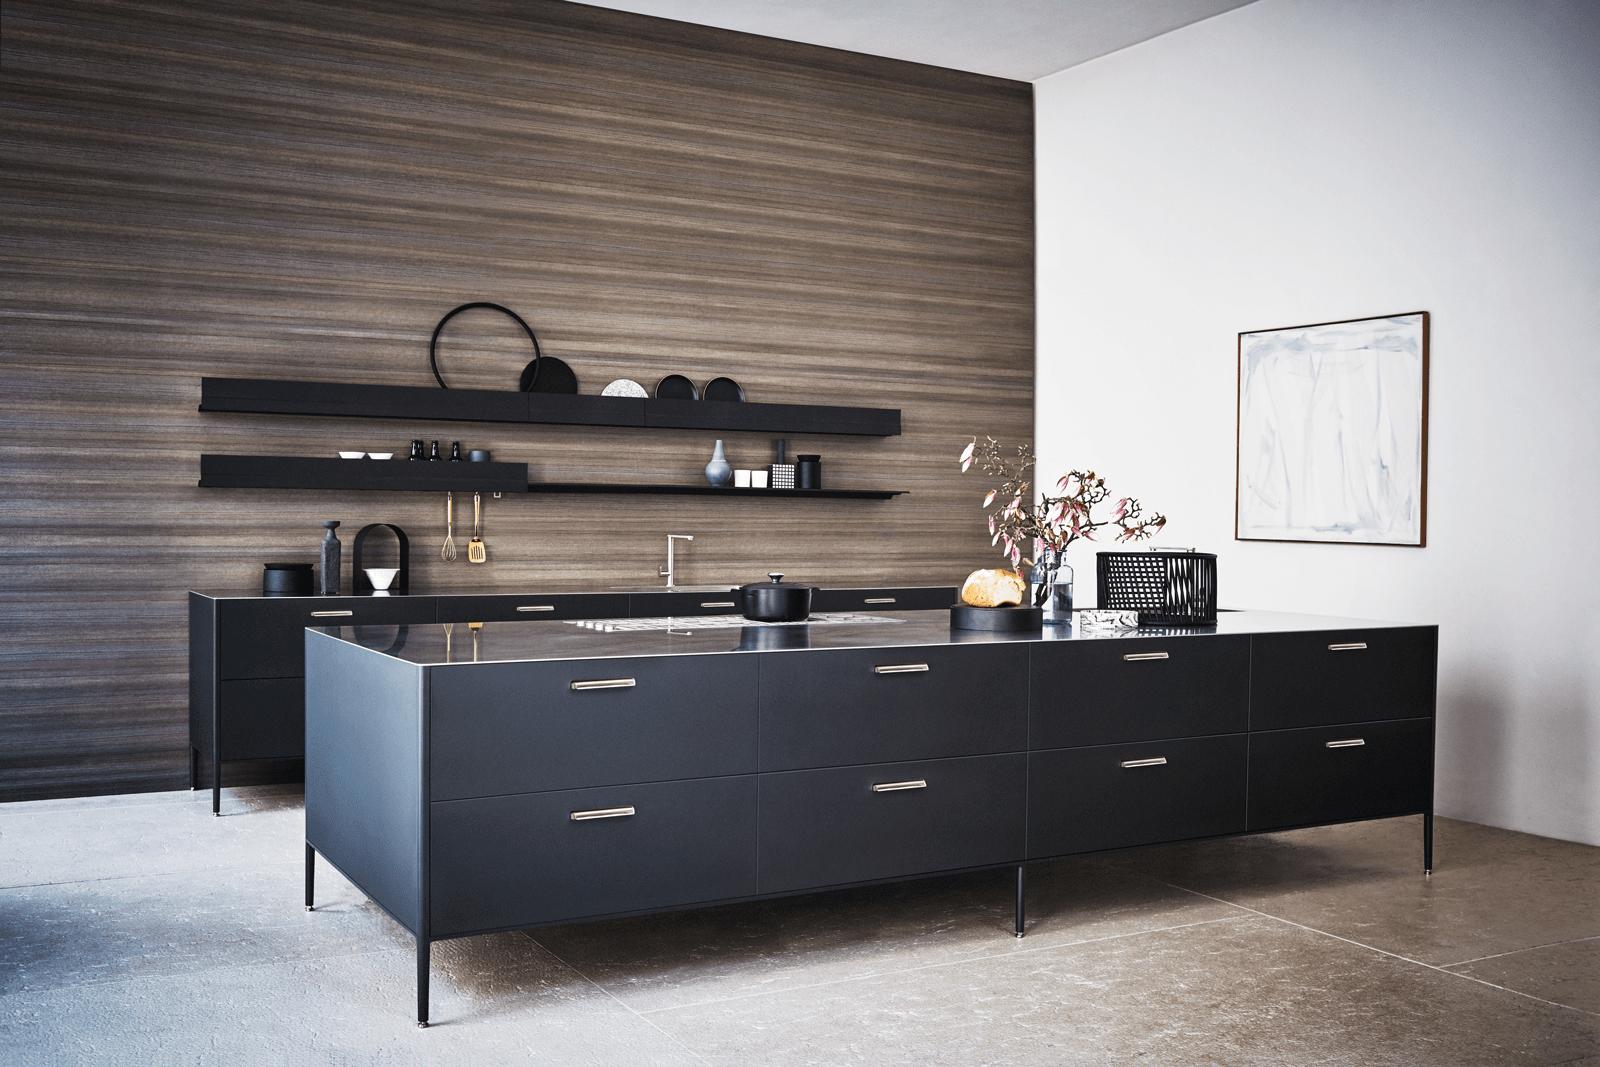 100+ [ Beautiful Cucine Componibili Usate Torino Gallery ] | Best ...